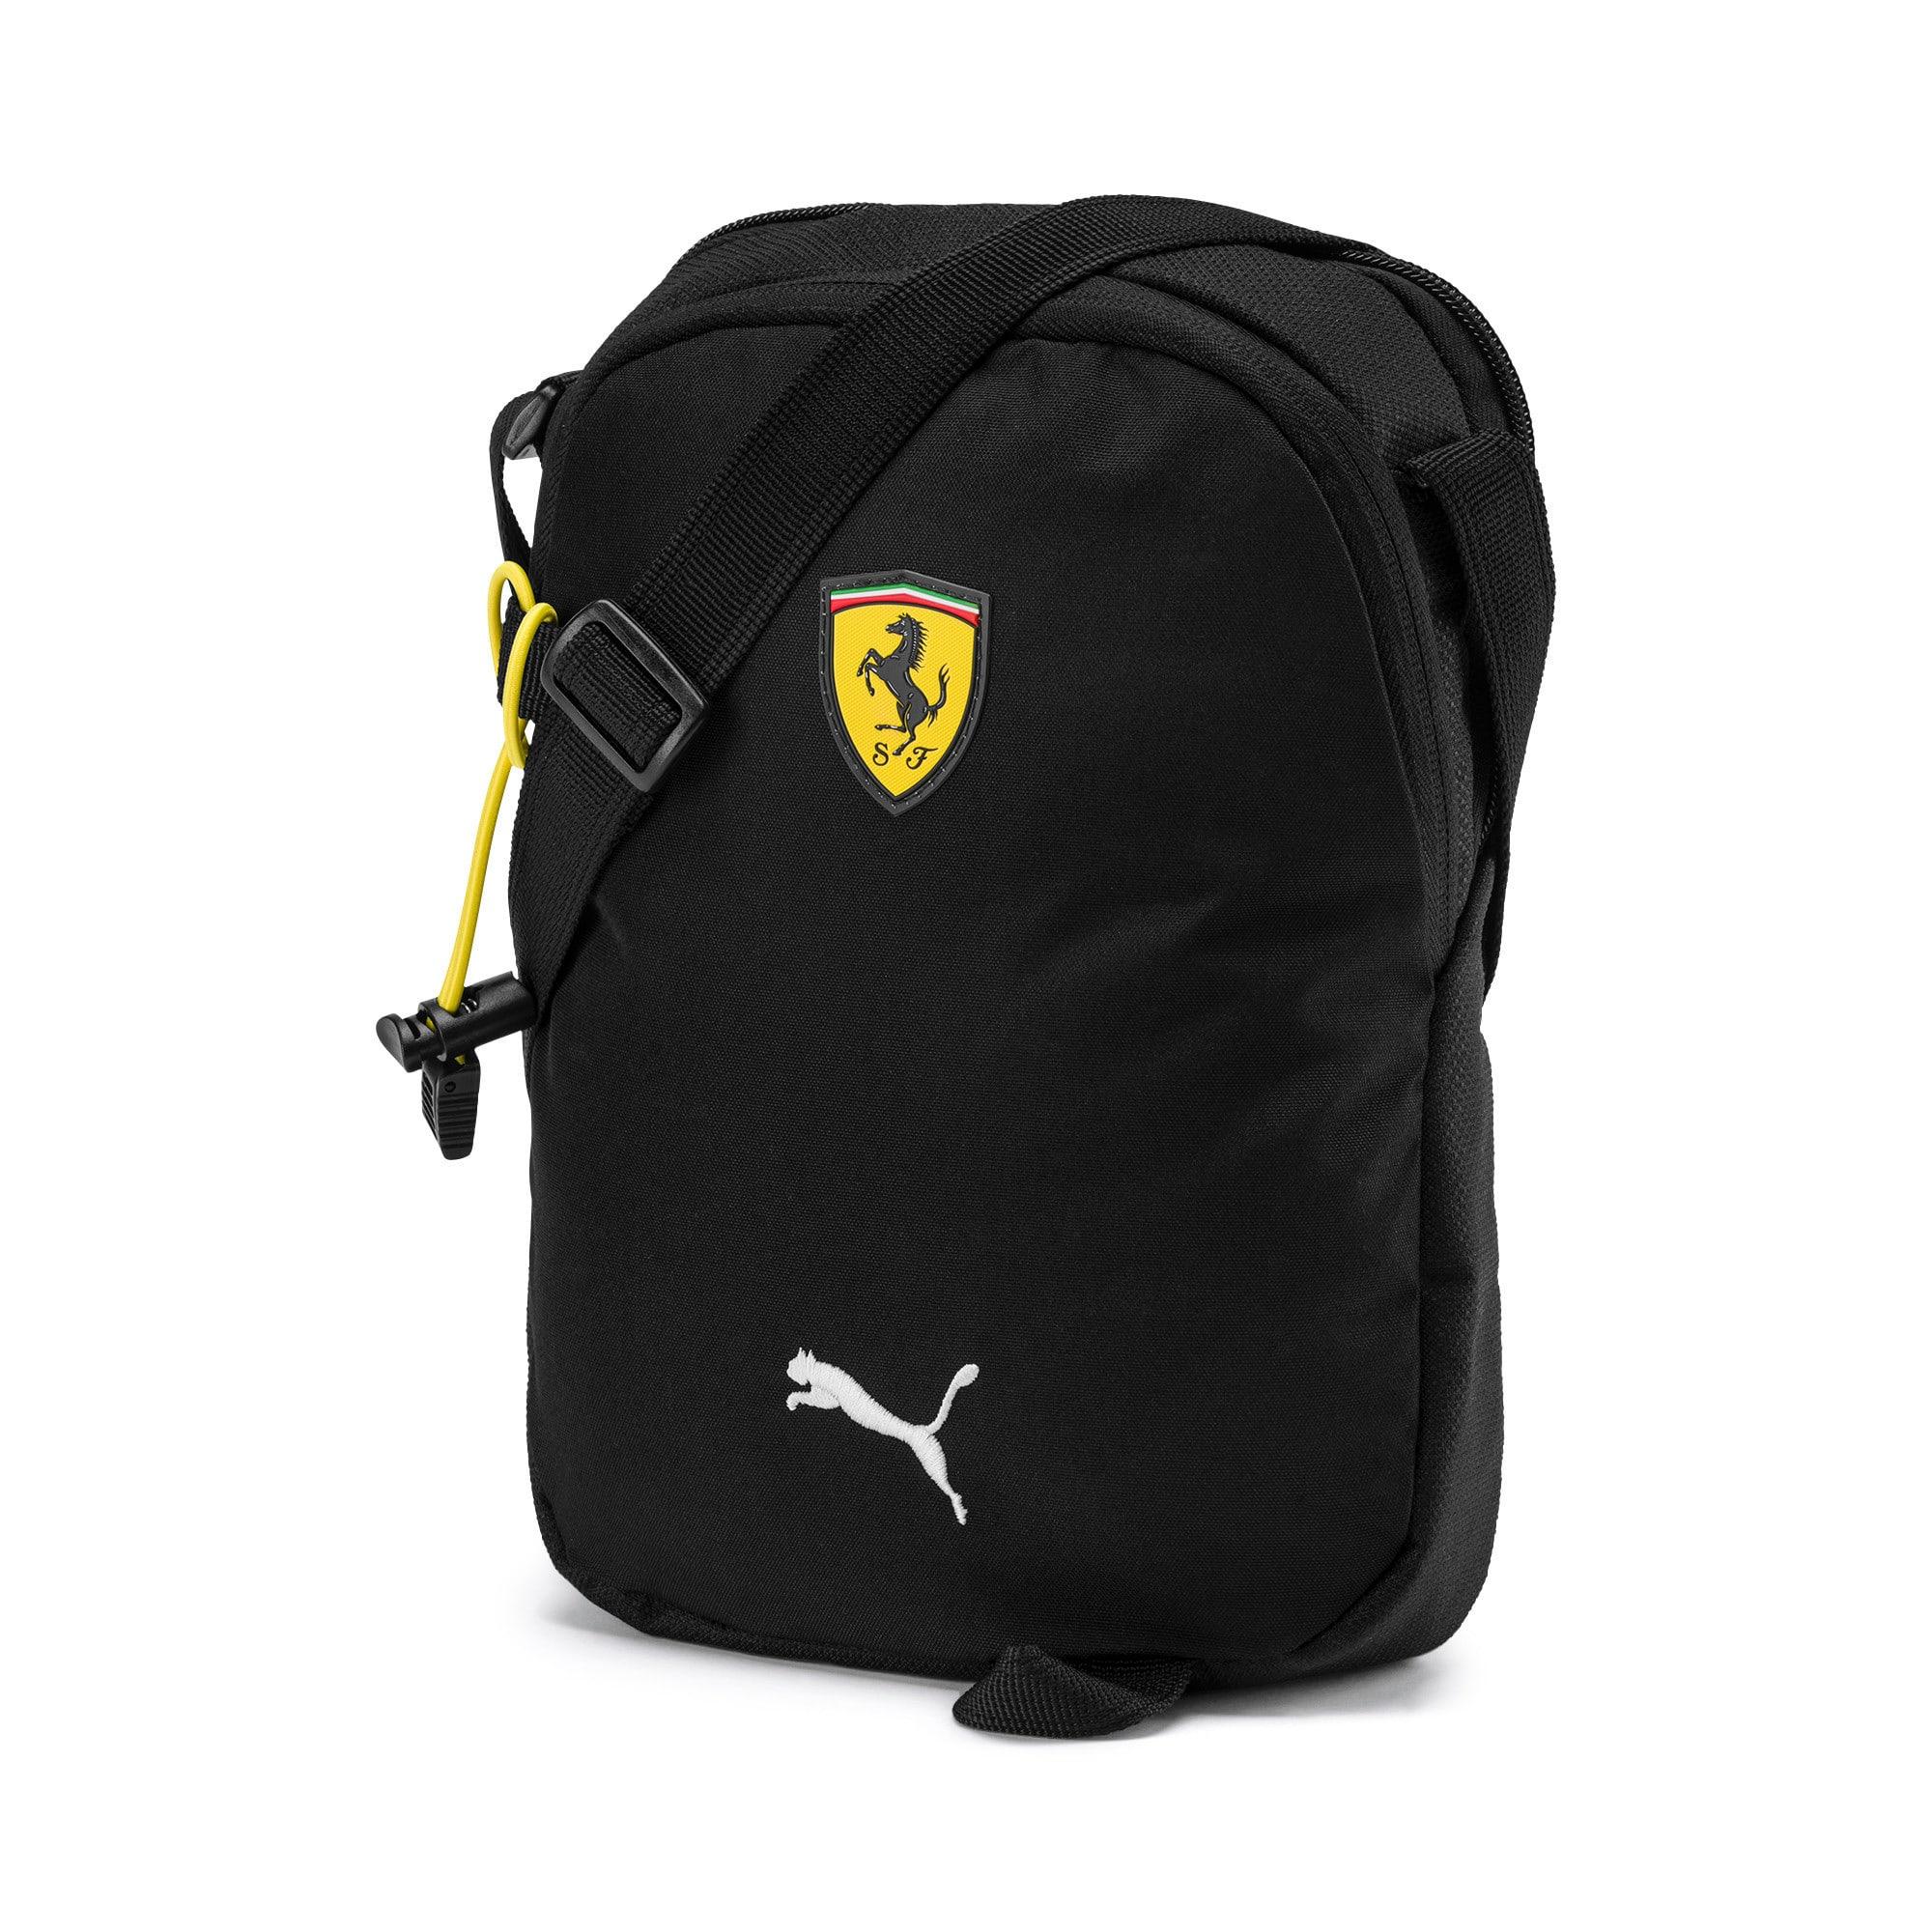 Thumbnail 1 of Scuderia Ferrari Fanwear Portable Bag, Puma Black, medium